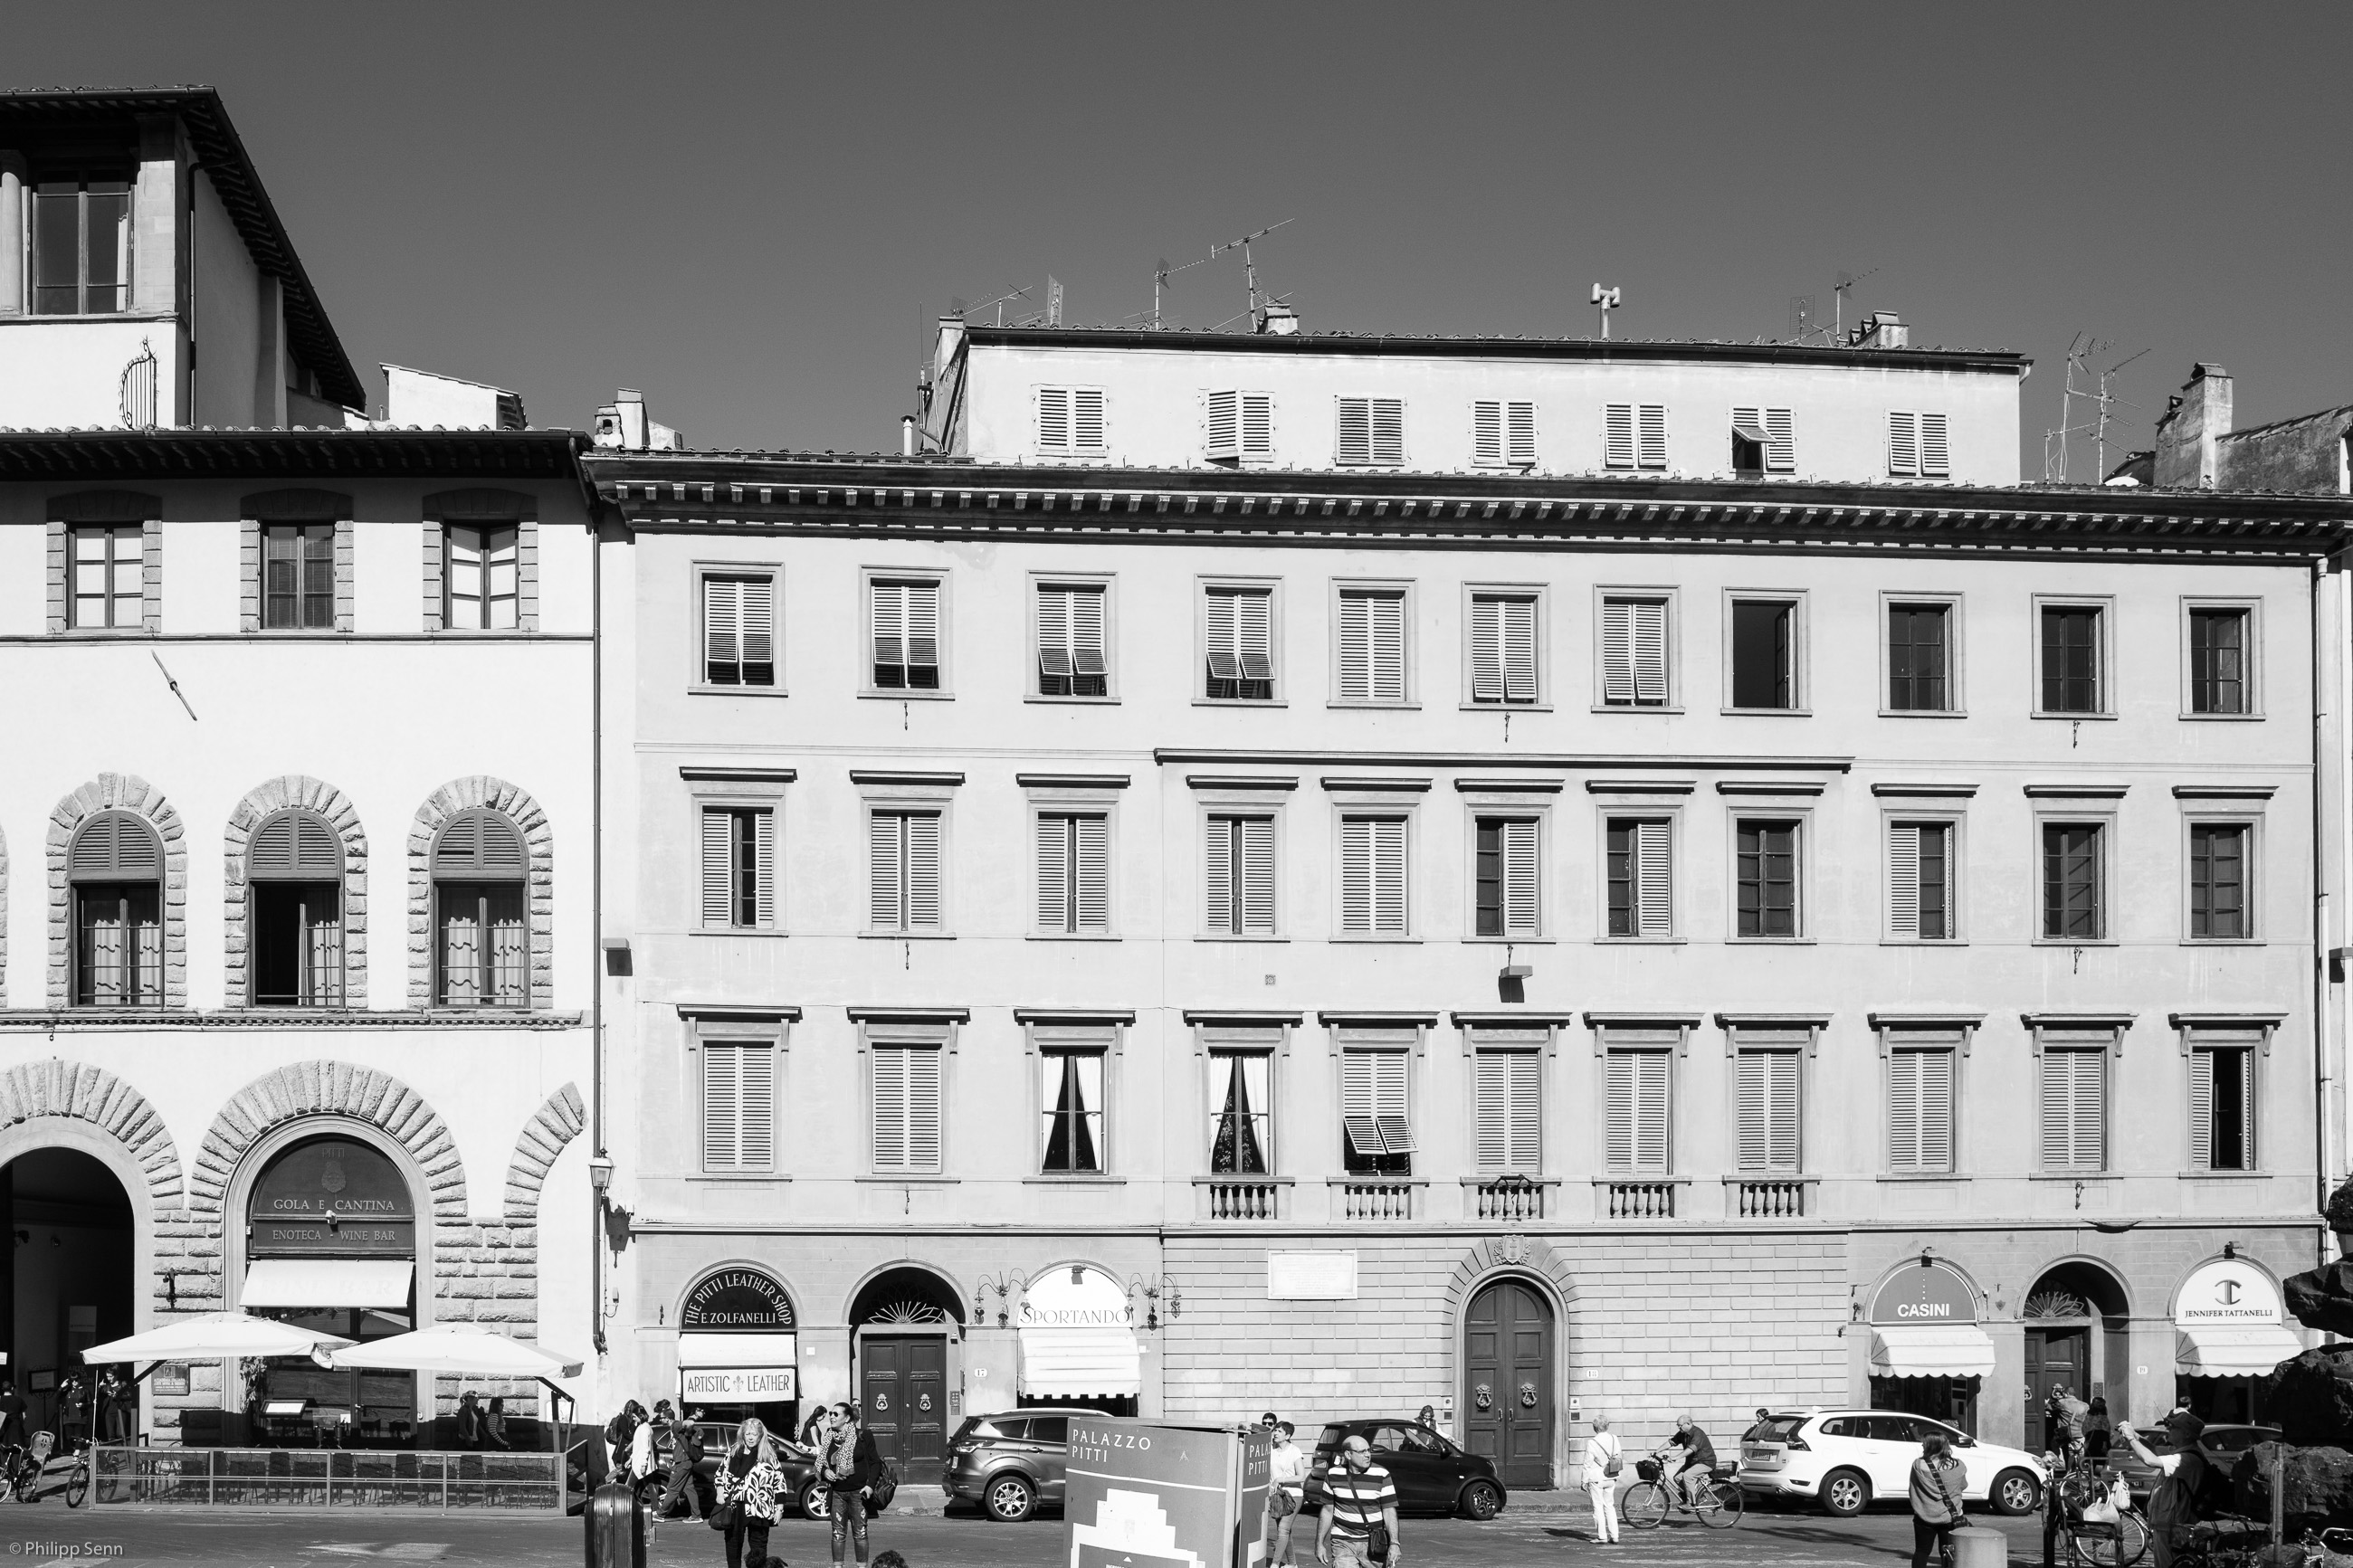 © Philipp Senn. 2016. Florenz. Piazza dei Pitti.